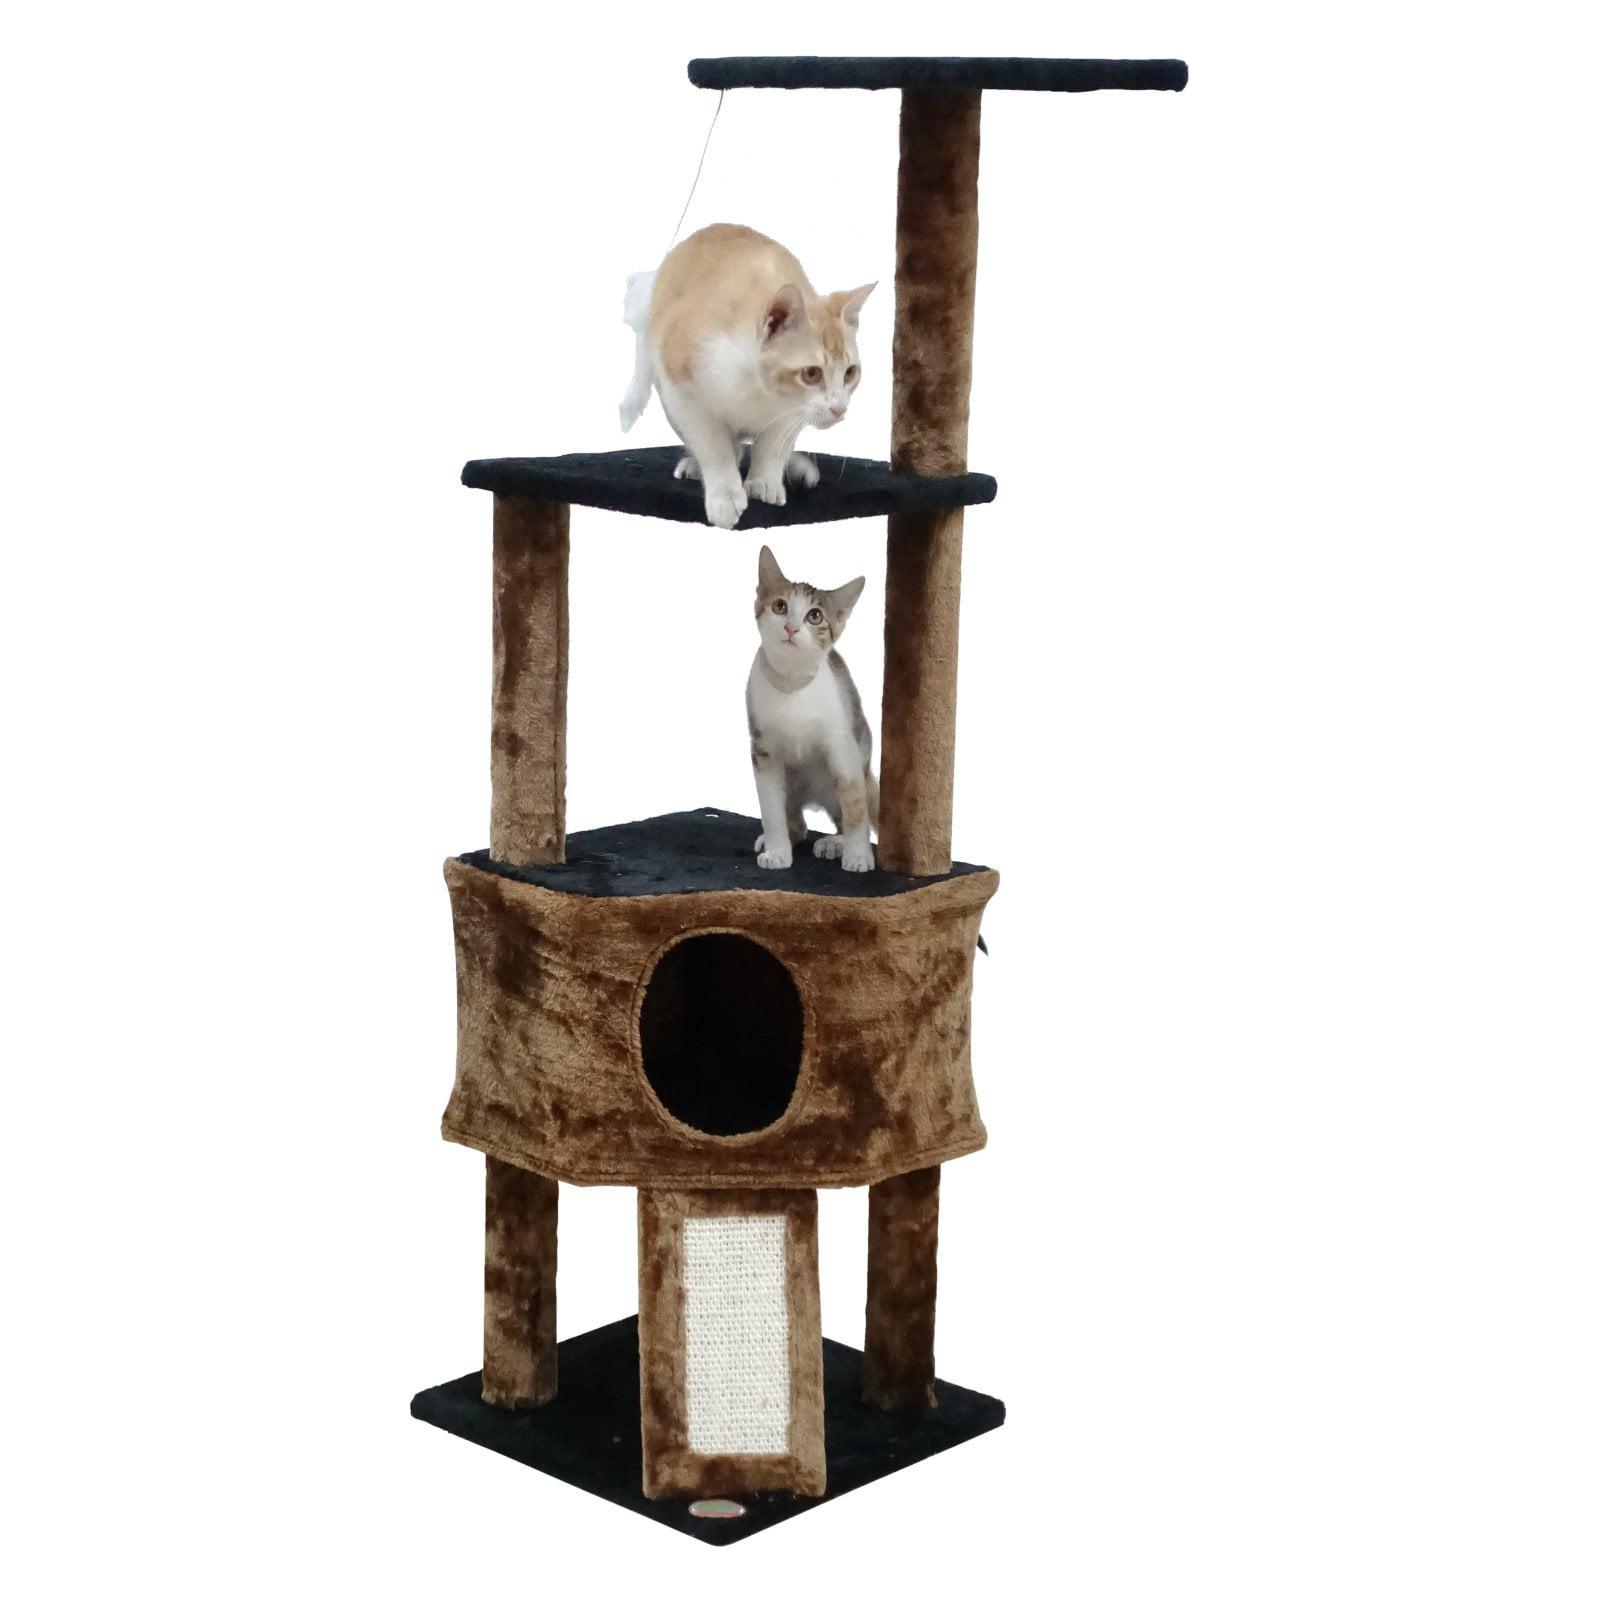 Go Pet Club 46 in. Cat Tree Condo by Overstock